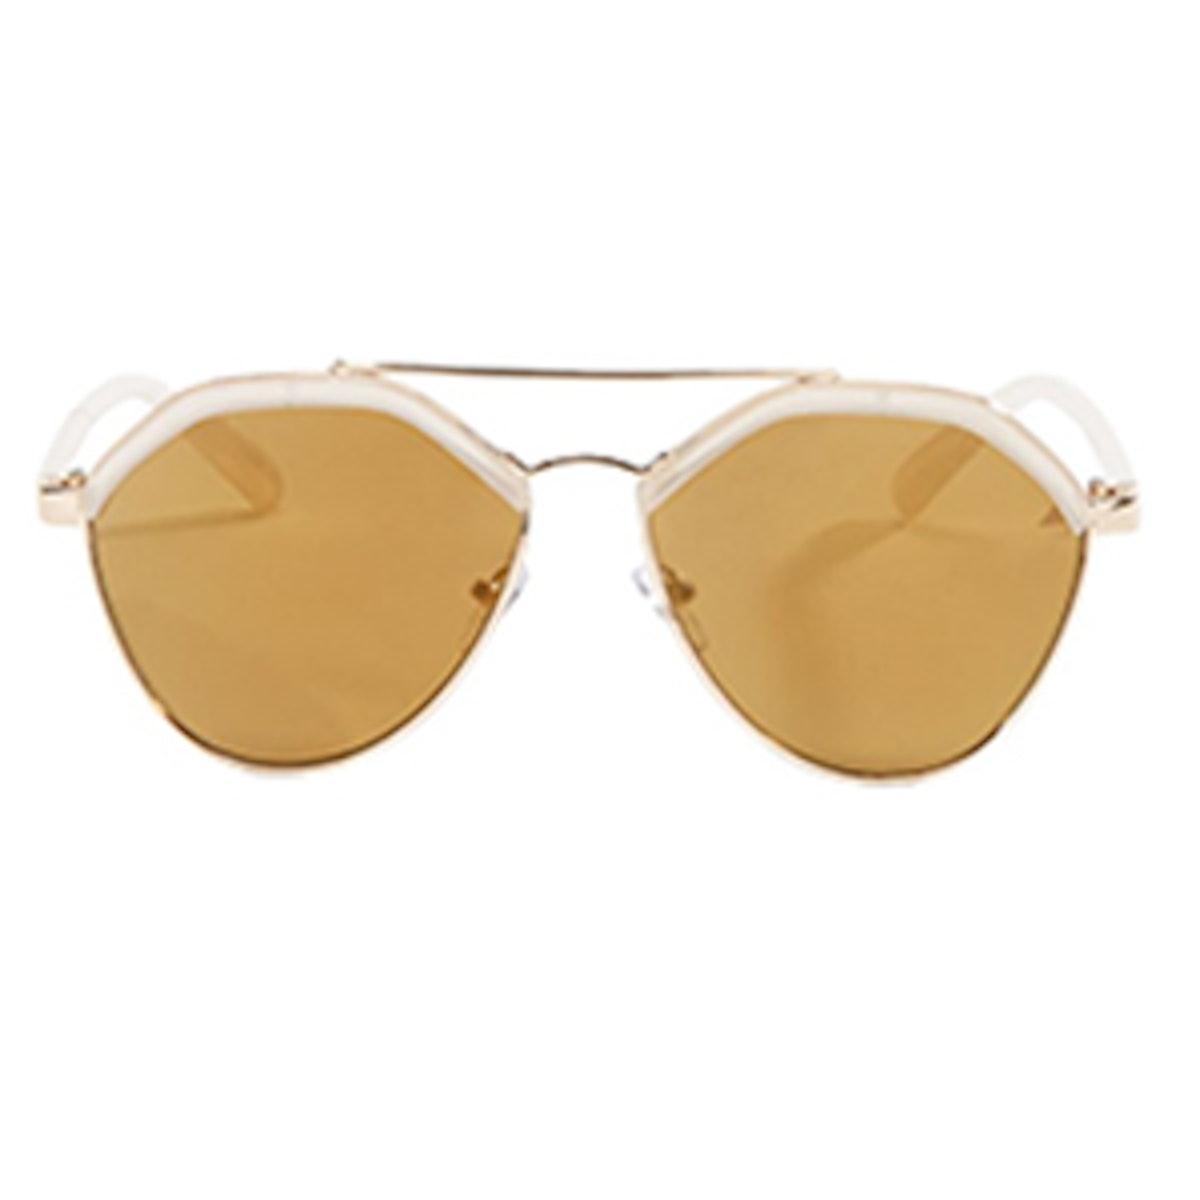 Topped Aviator Sunglasses